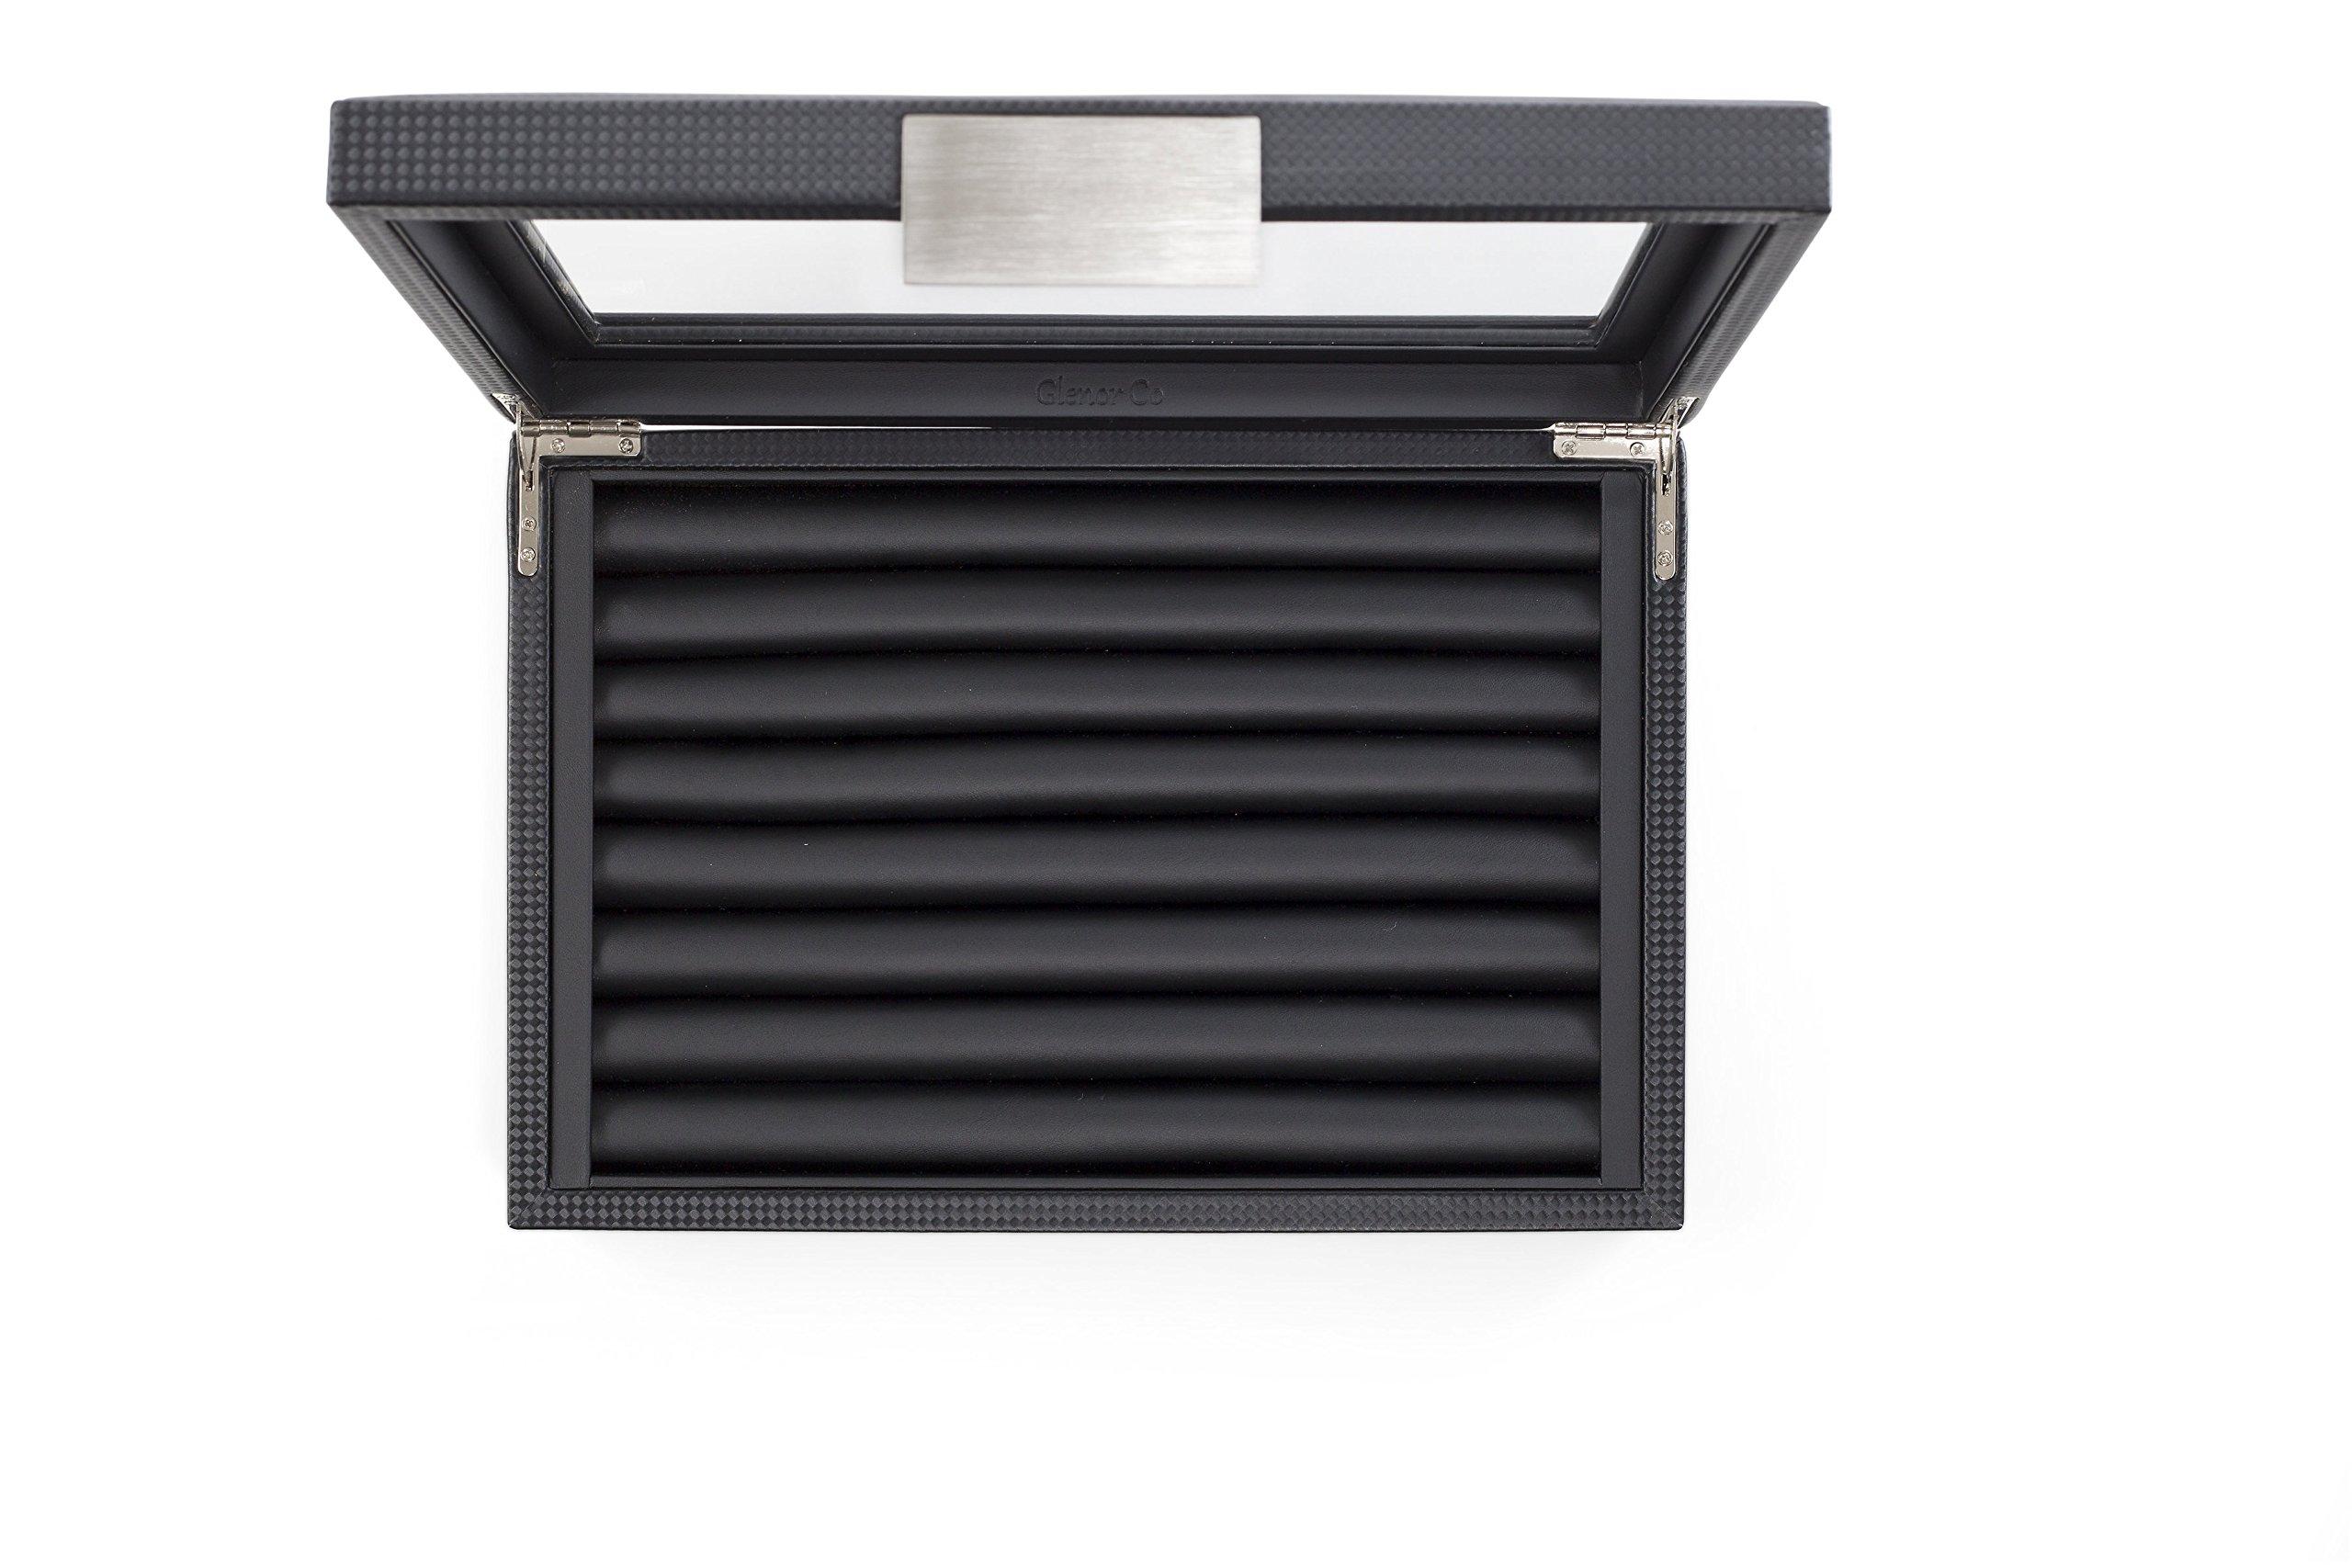 Glenor Co Cufflink Box for Men - Holds 70 Cufflinks - Luxury Display Jewelry Case -Carbon Fiber Design - Metal Buckle Holder, Large Glass Top - Black by Glenor Co (Image #8)